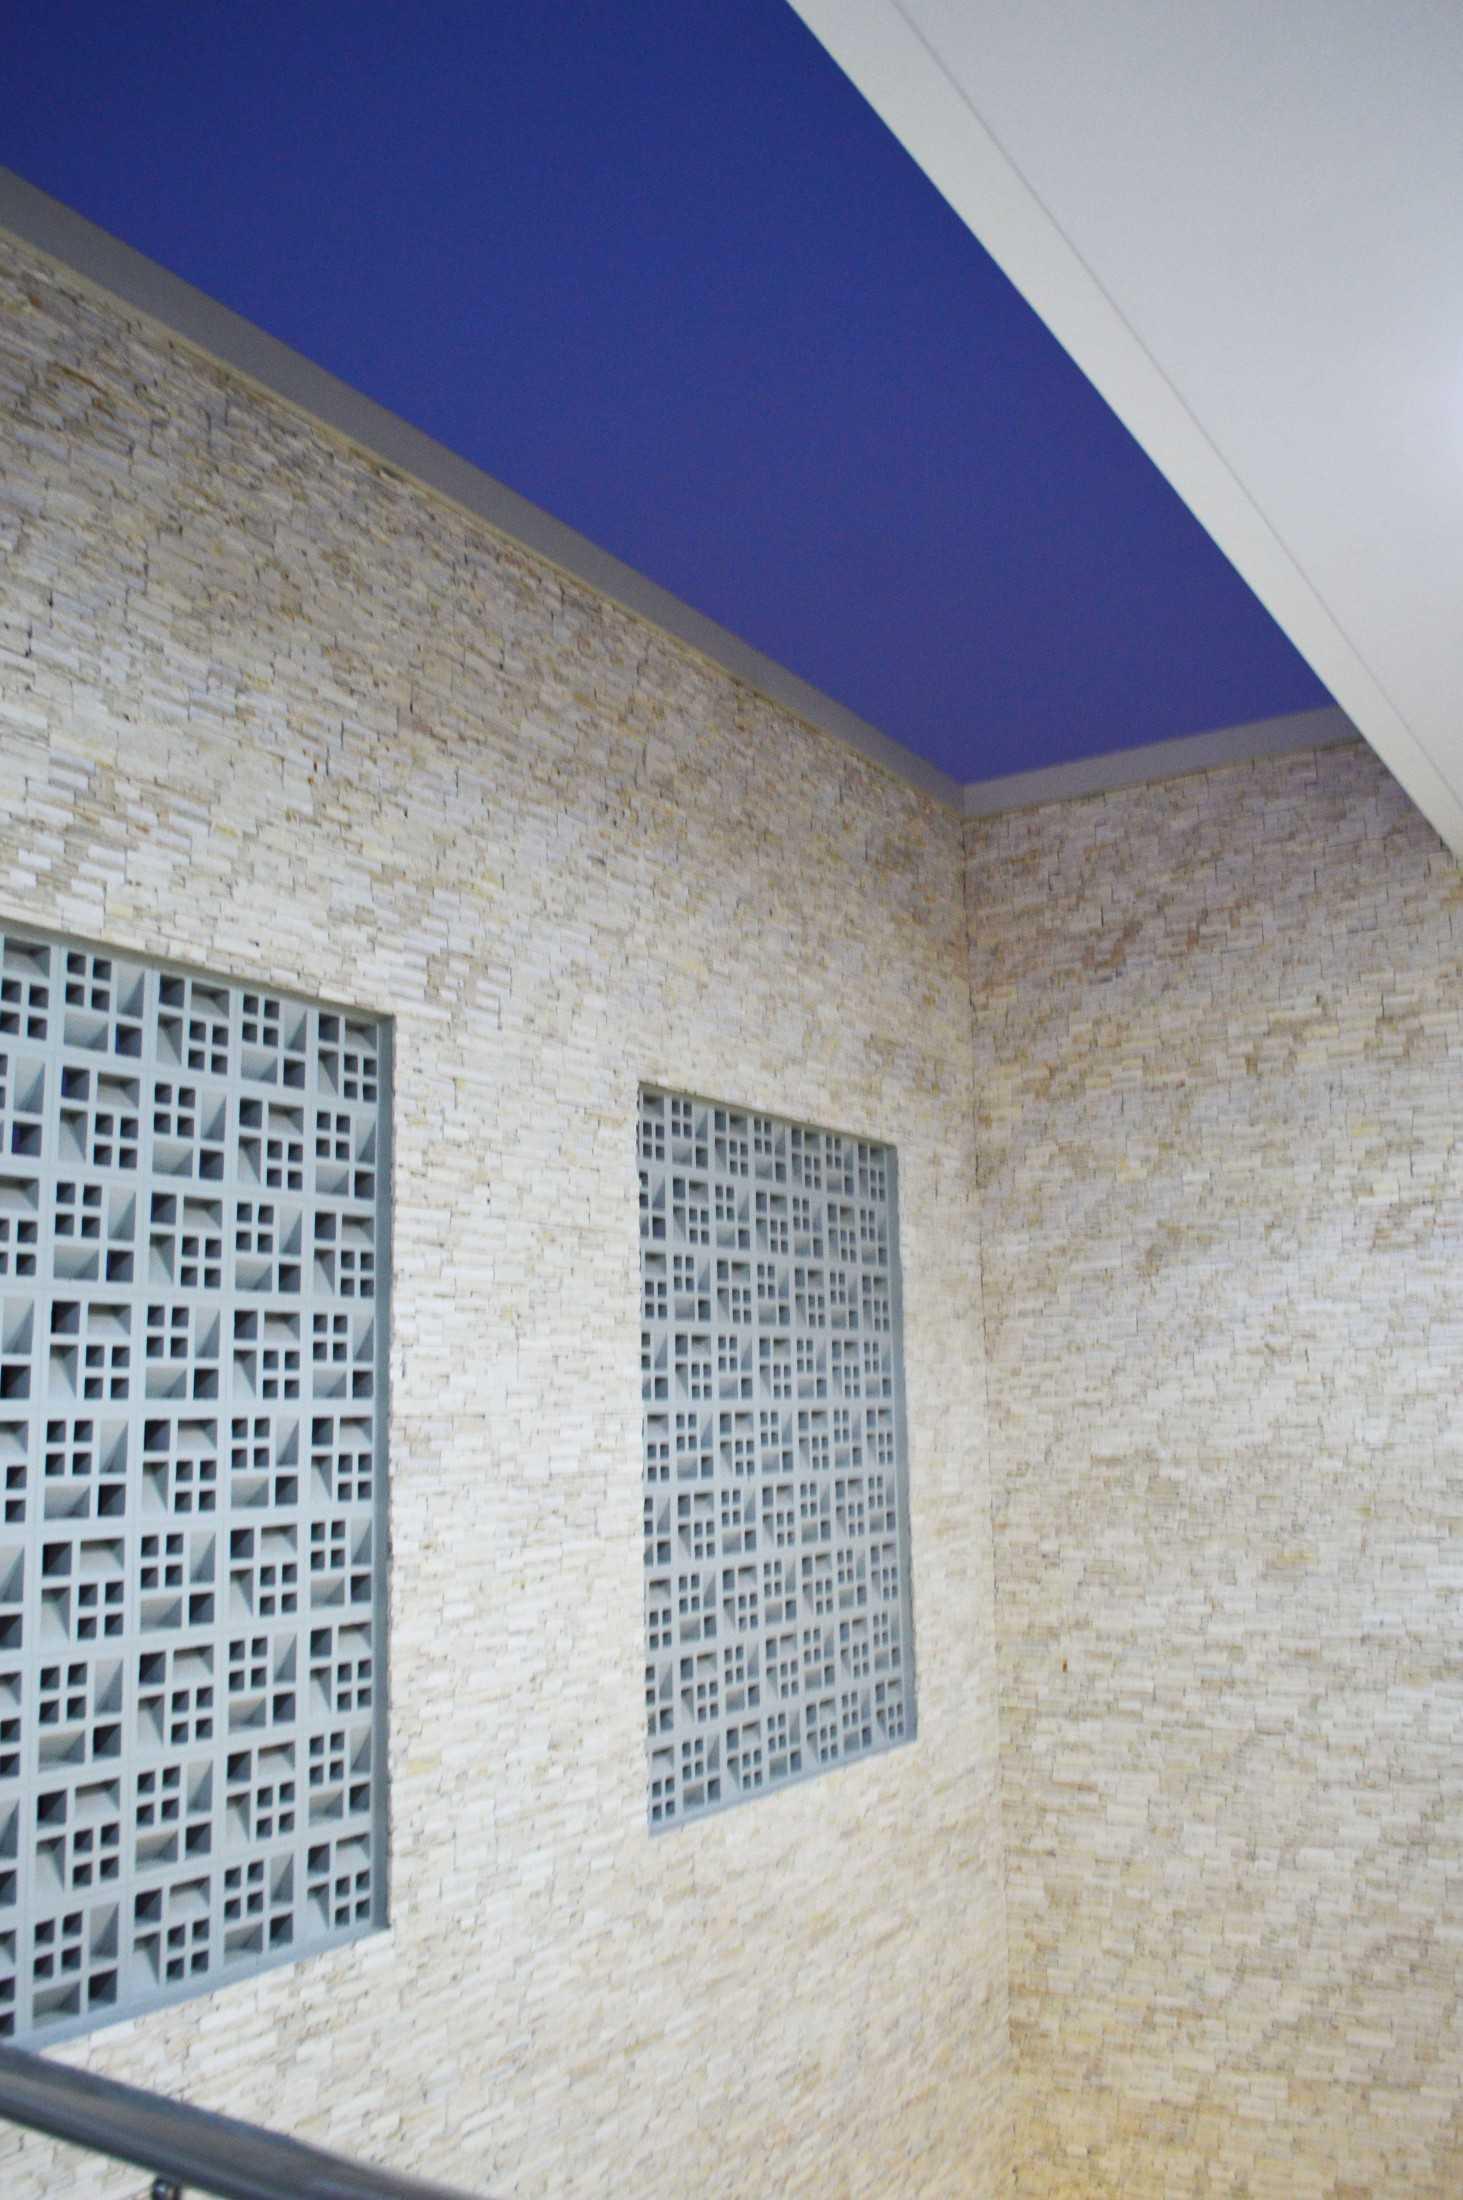 Conarch Studio Modern House With Natural Color Palette Surakarta, Kota Surakarta, Jawa Tengah, Indonesia Surakarta, Kota Surakarta, Jawa Tengah, Indonesia Mini Outdoor Space  122980